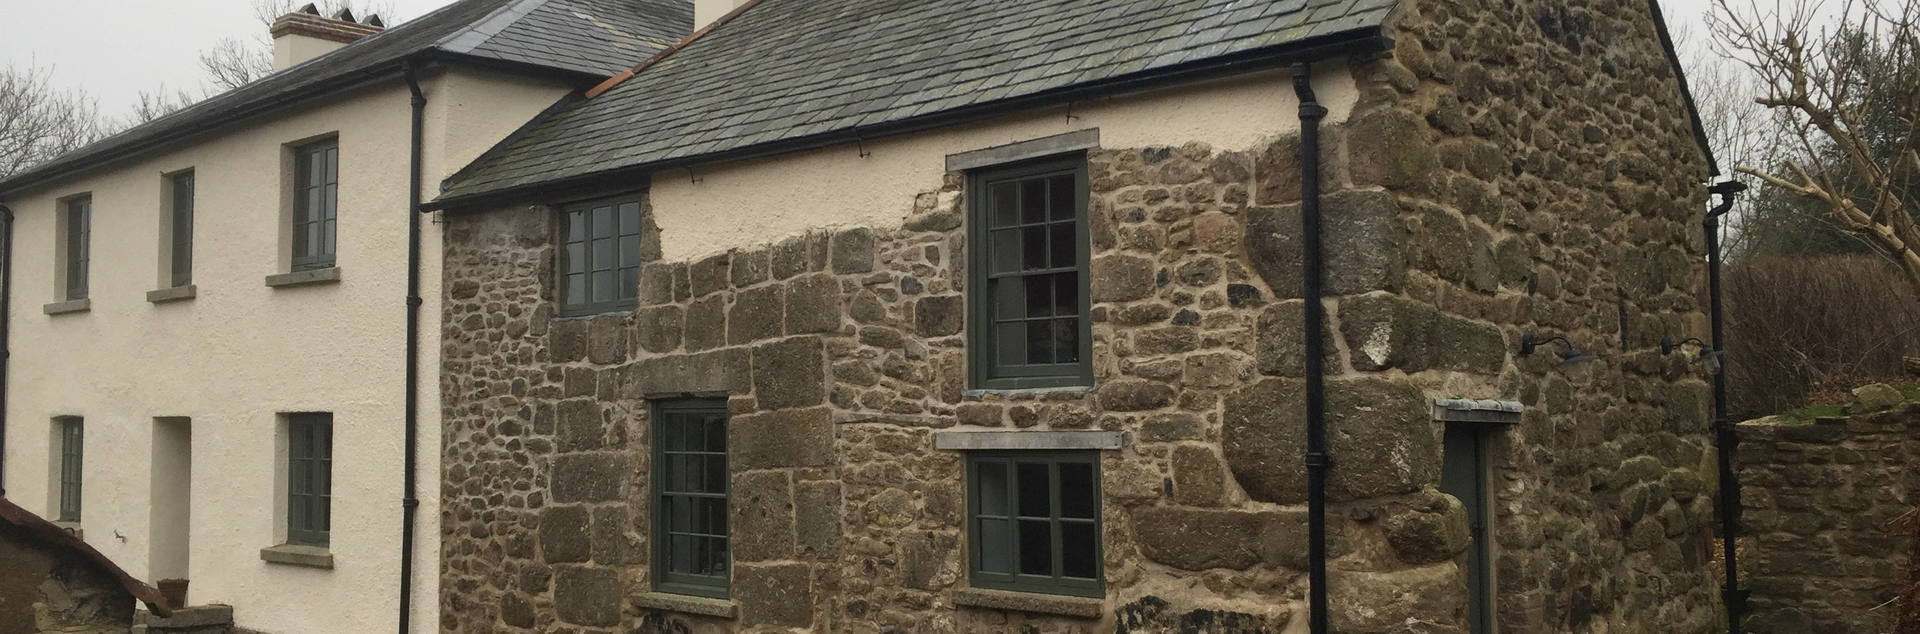 A 16th Century Barn Conversion in Dartmoor National Park